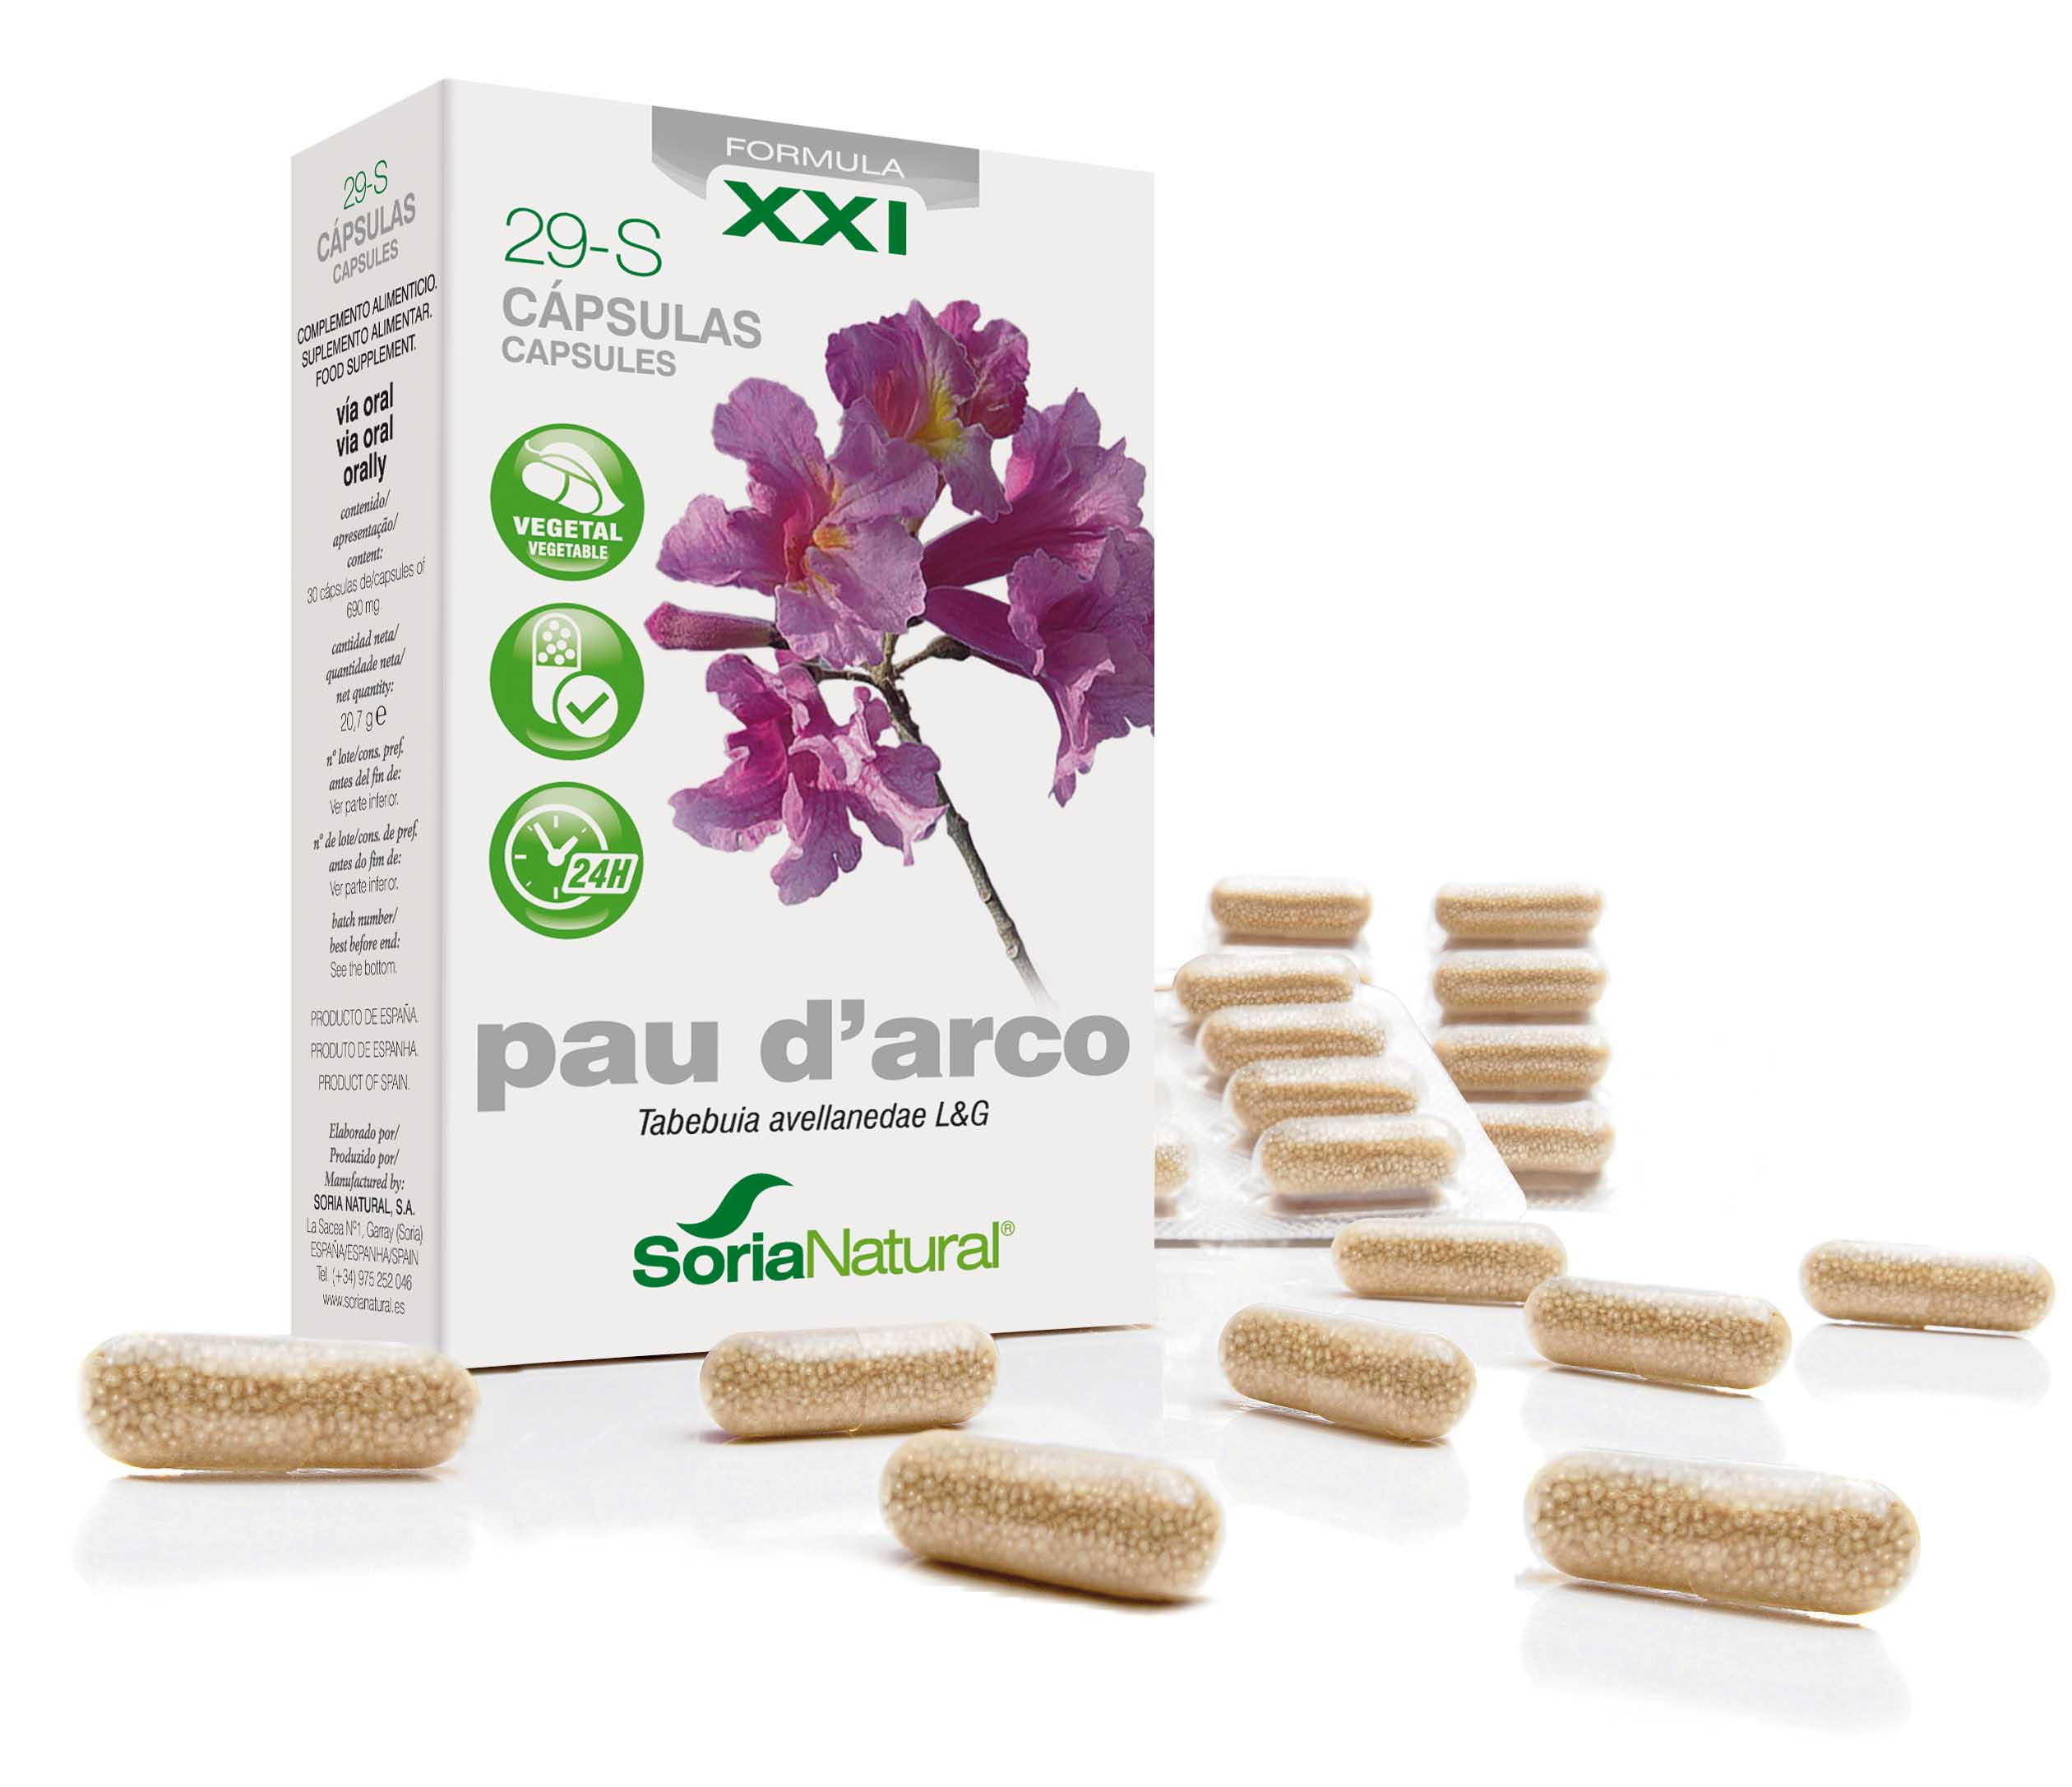 29-S Pau d'arco XXI: pau d'arco 300 mg